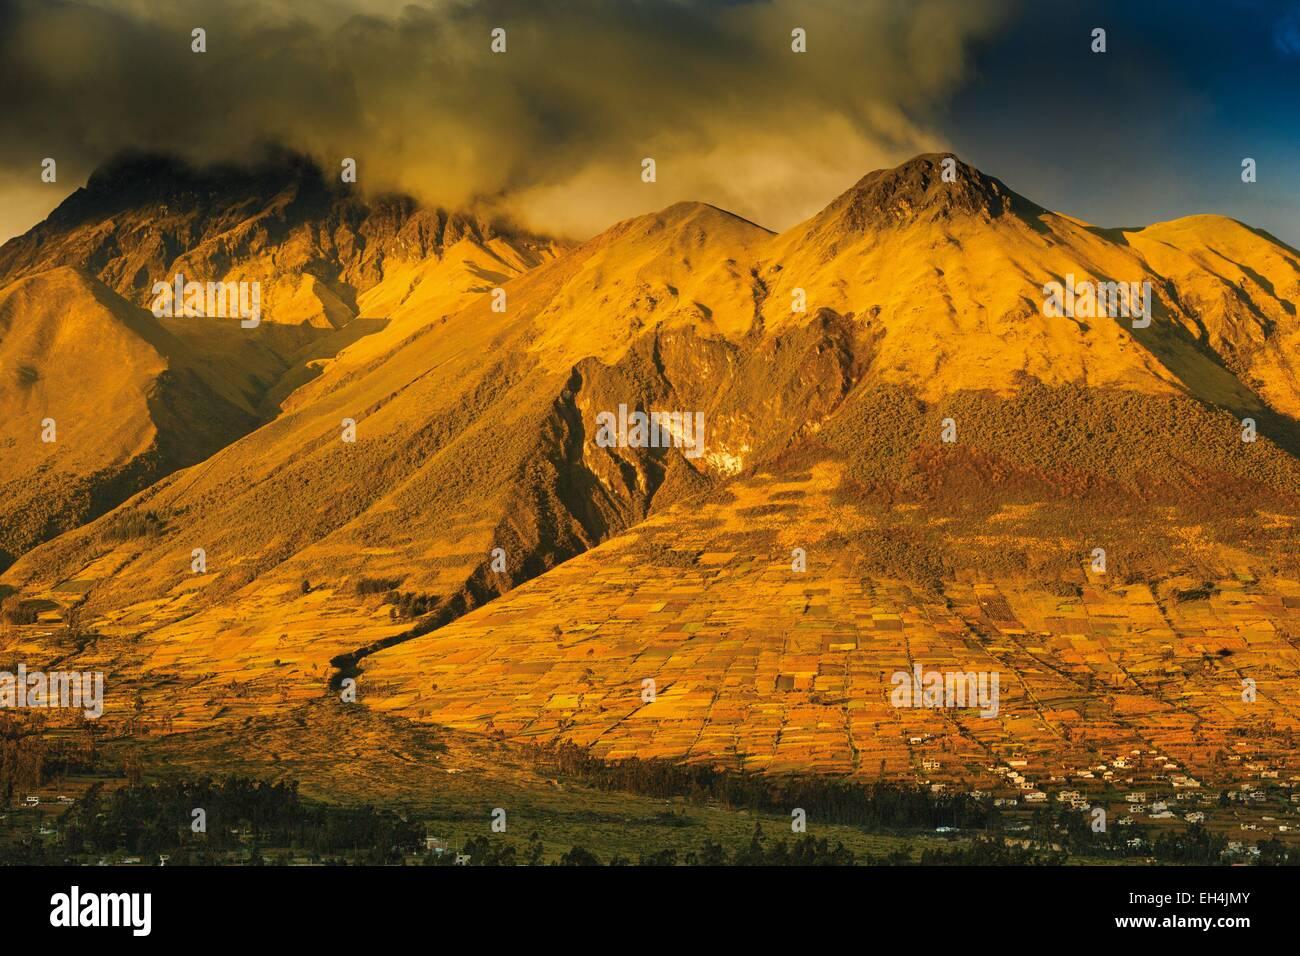 Ecuador, Imbabura, Otavalo, view of Imbabura volcano in the clouds at sunset - Stock Image